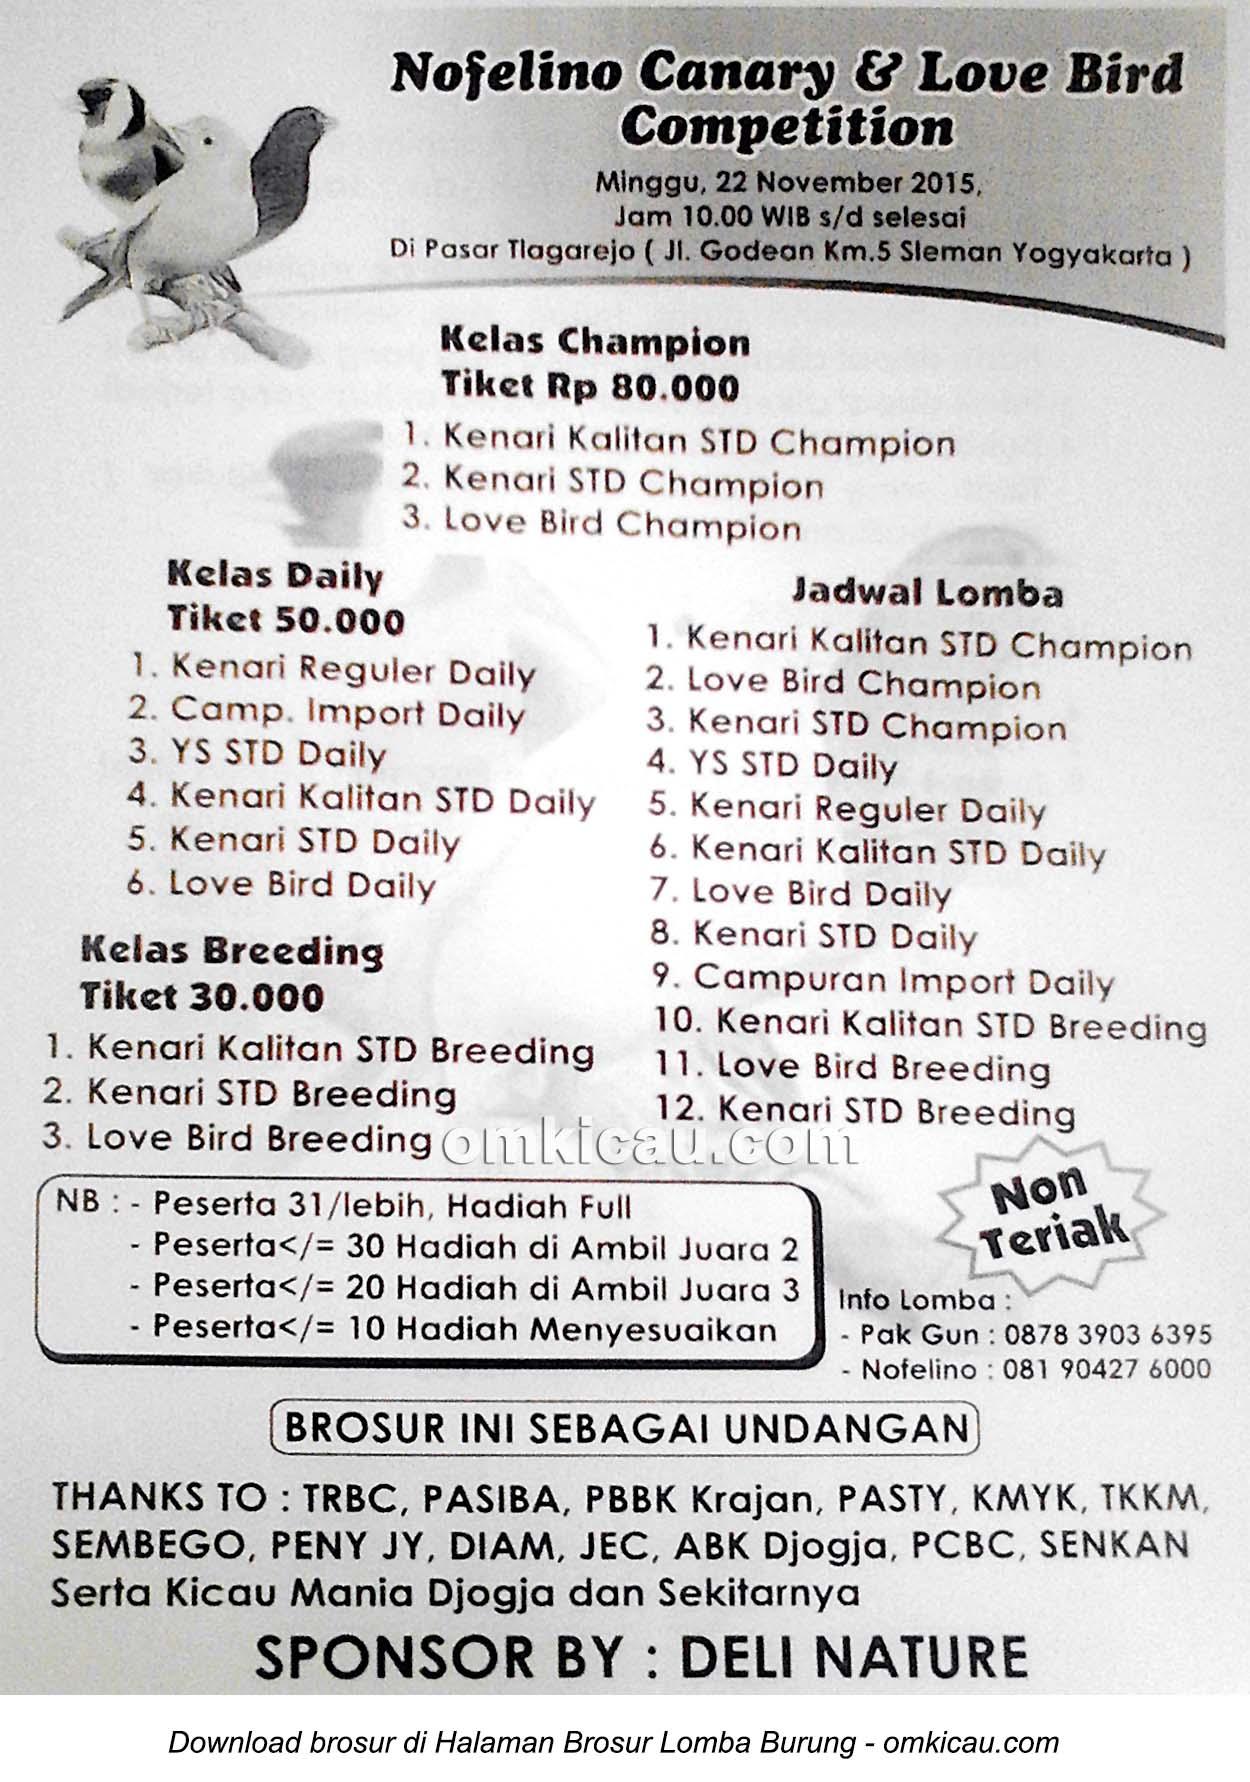 Brosur Lomba Burung Berkicau Nofelino Canary & Lovebird Competition, Jogja, 22 November 2015